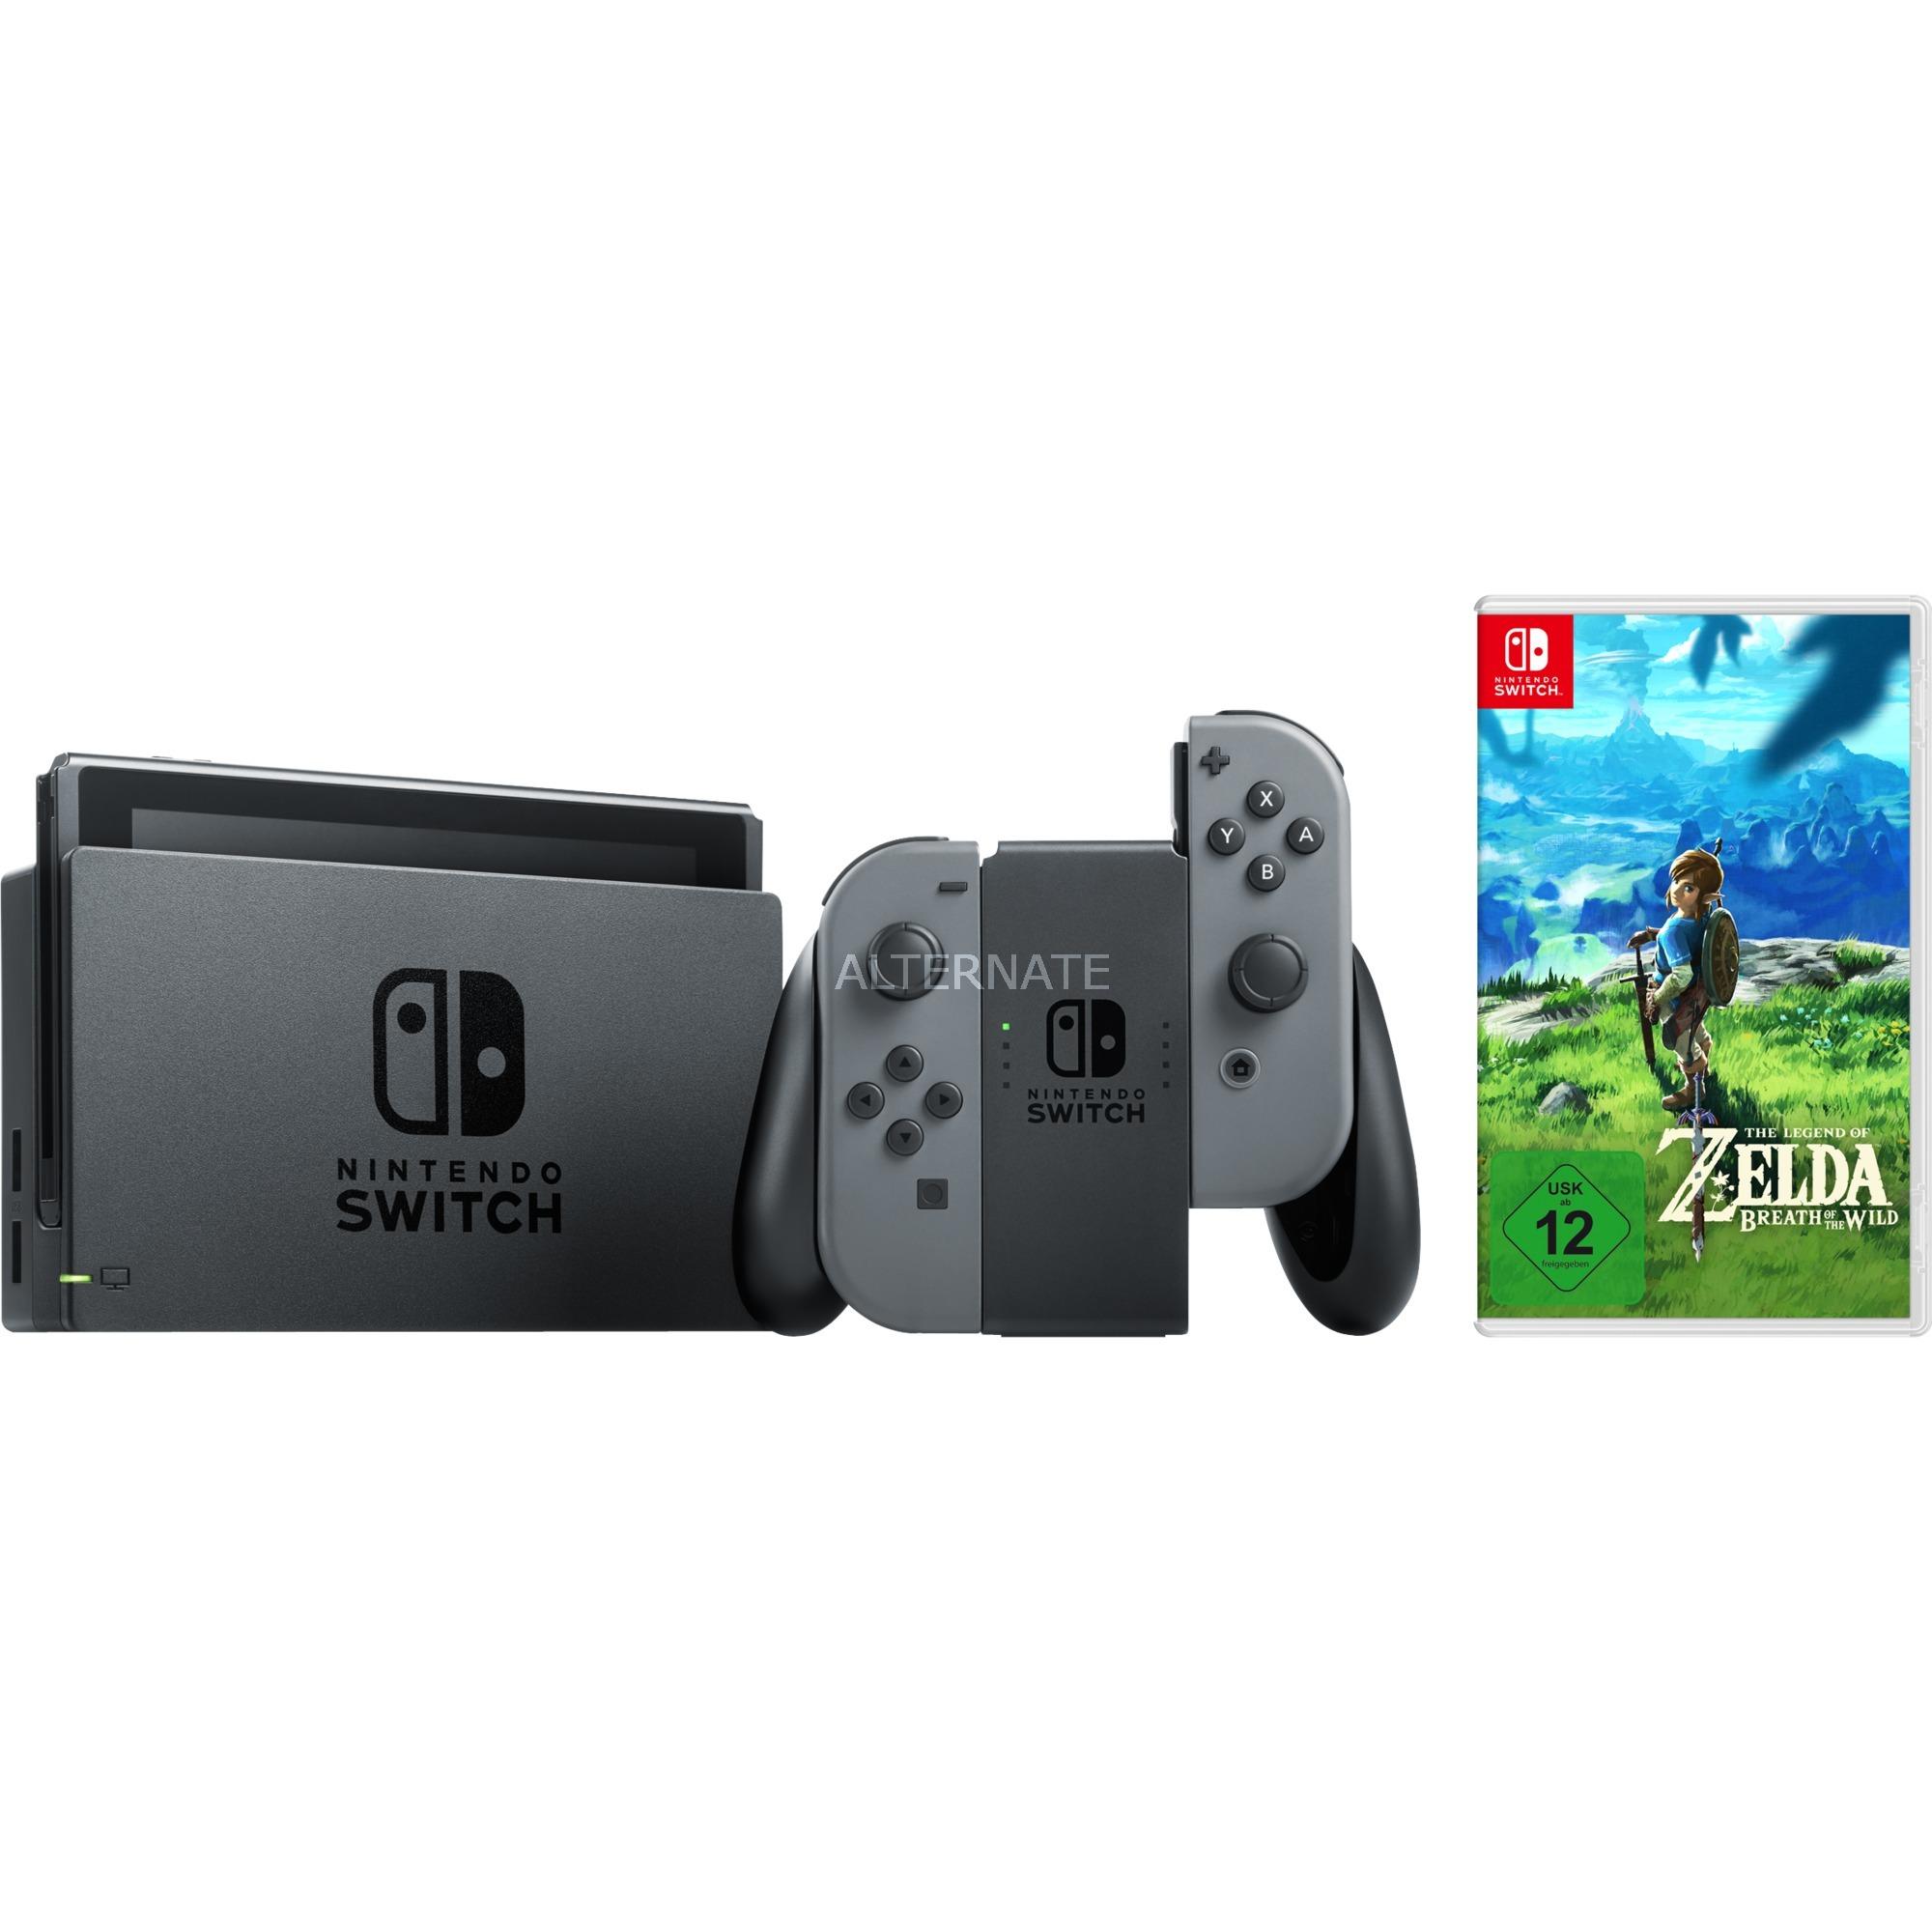 Switch, Console de jeu